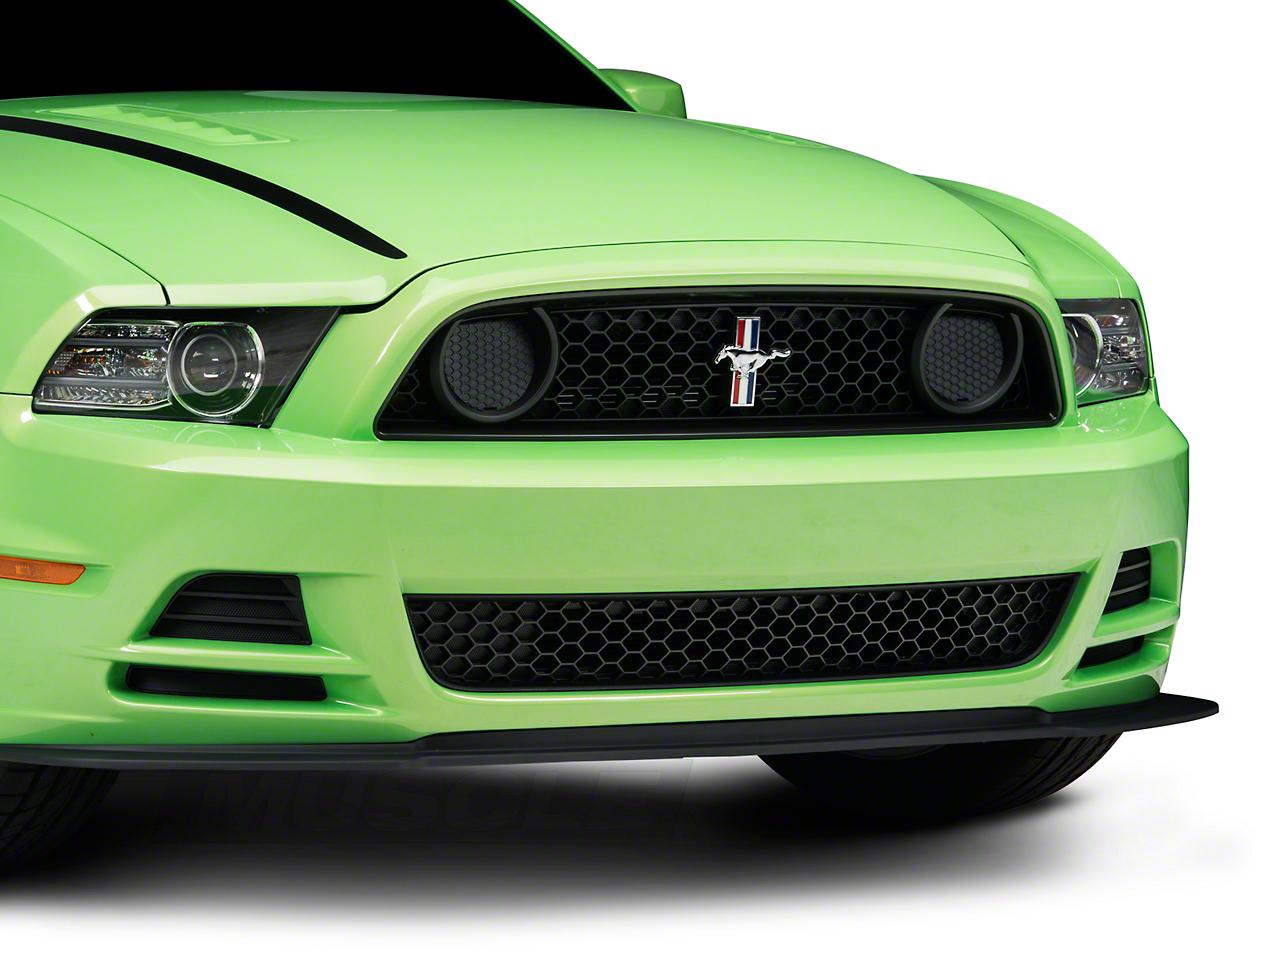 Ford Racing Boss 302 Grille w/ Emblem (13-14 GT, BOSS)